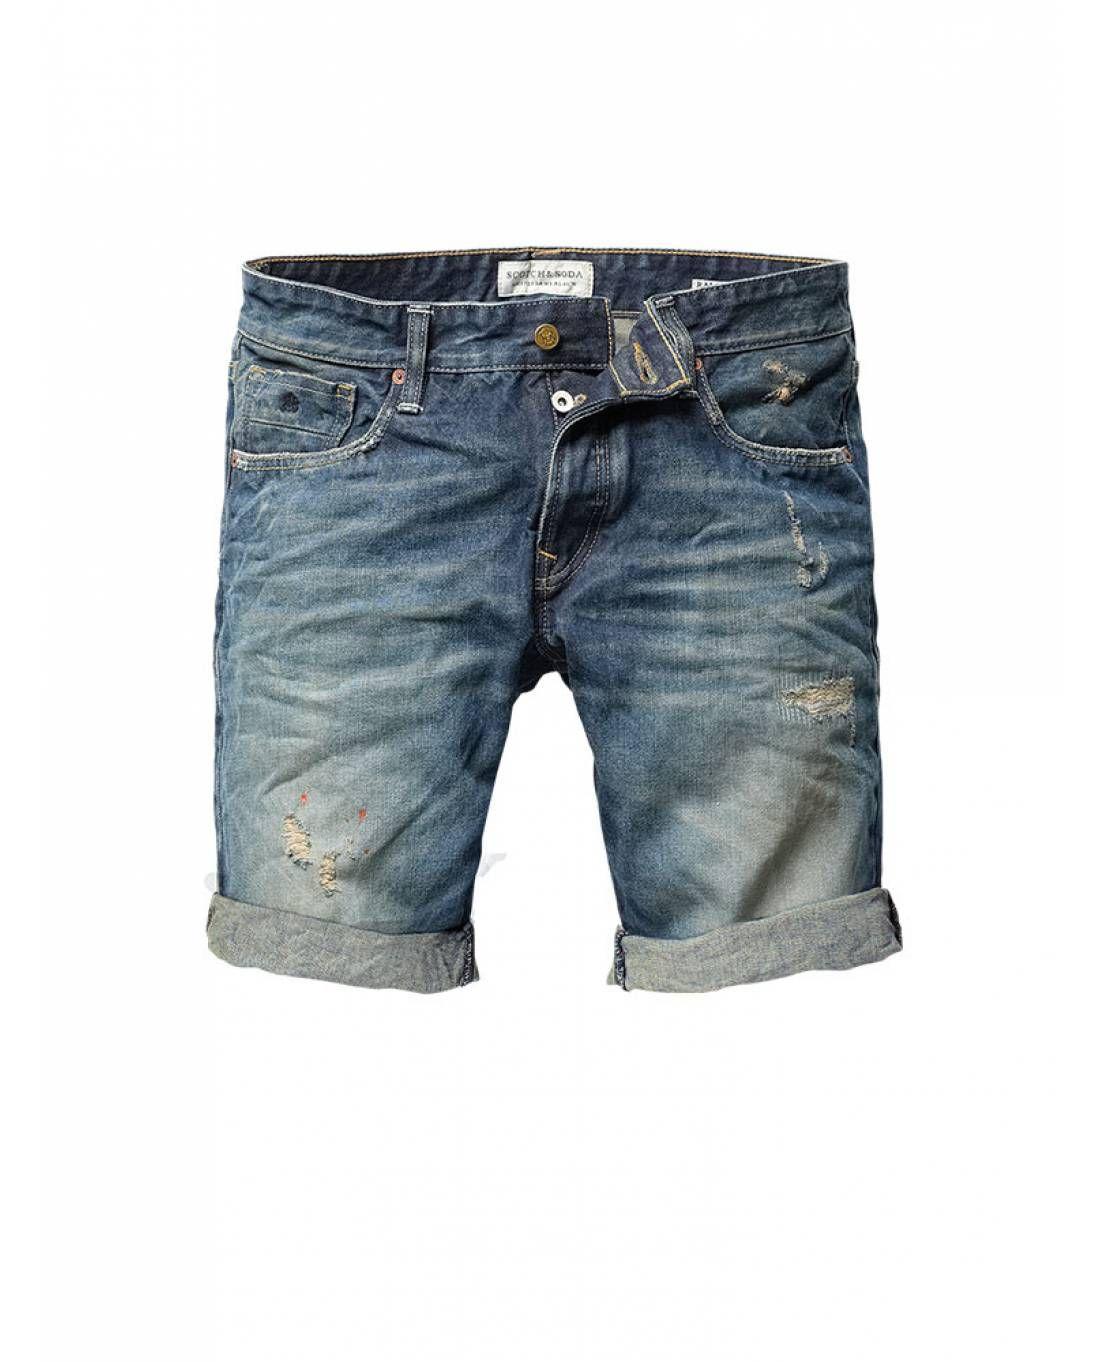 Ralston Shorts - Slim - Downer - Shorts - Official Scotch & Soda Online Fashion & Apparel Shops